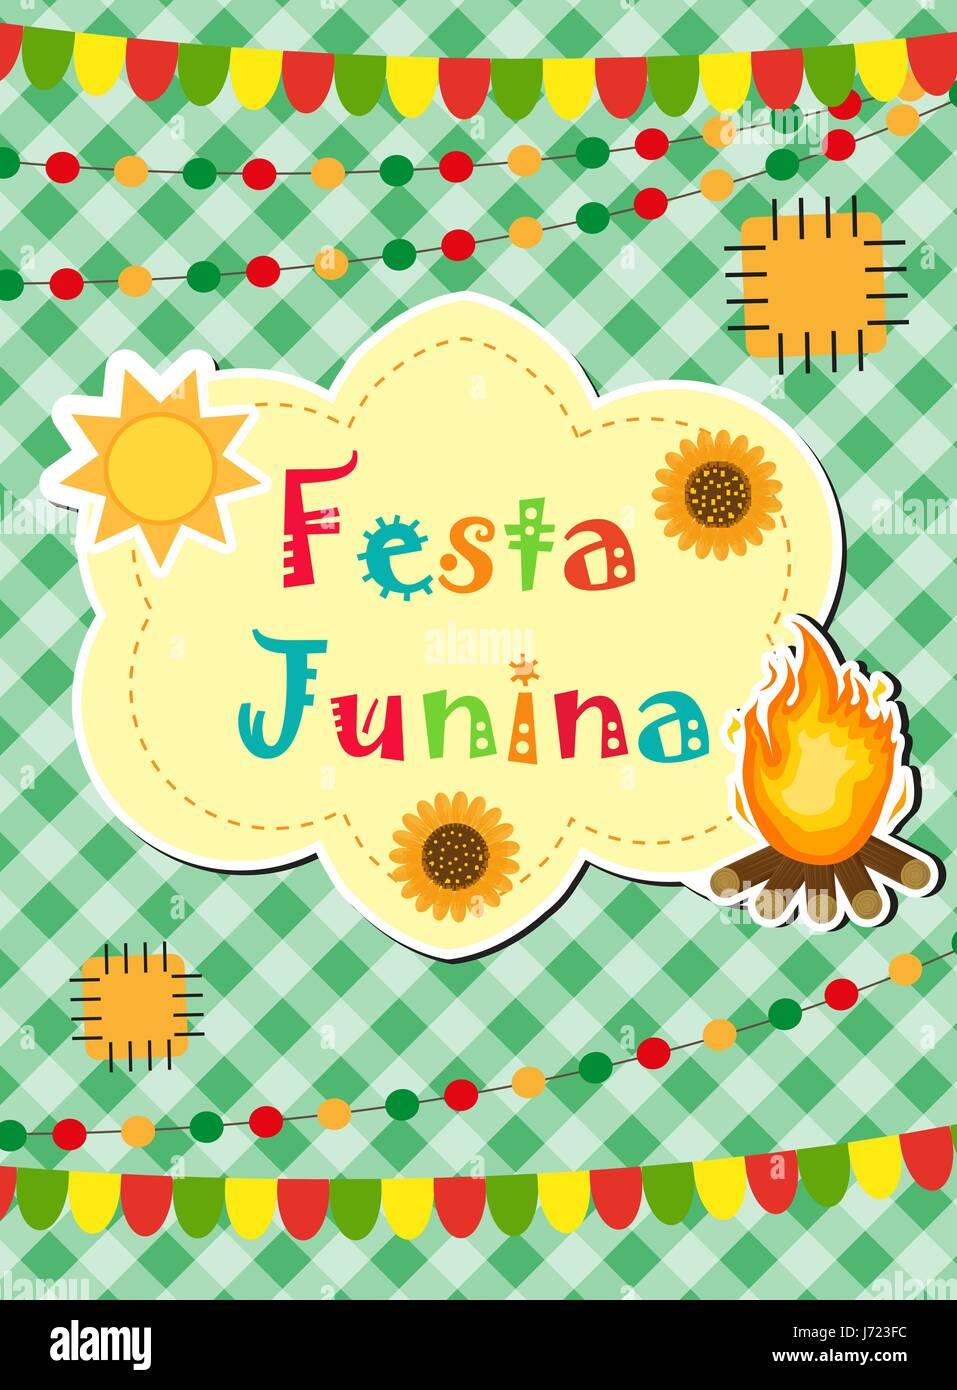 Festa Junina Grußkarte Einladung Plakat Brasilianische